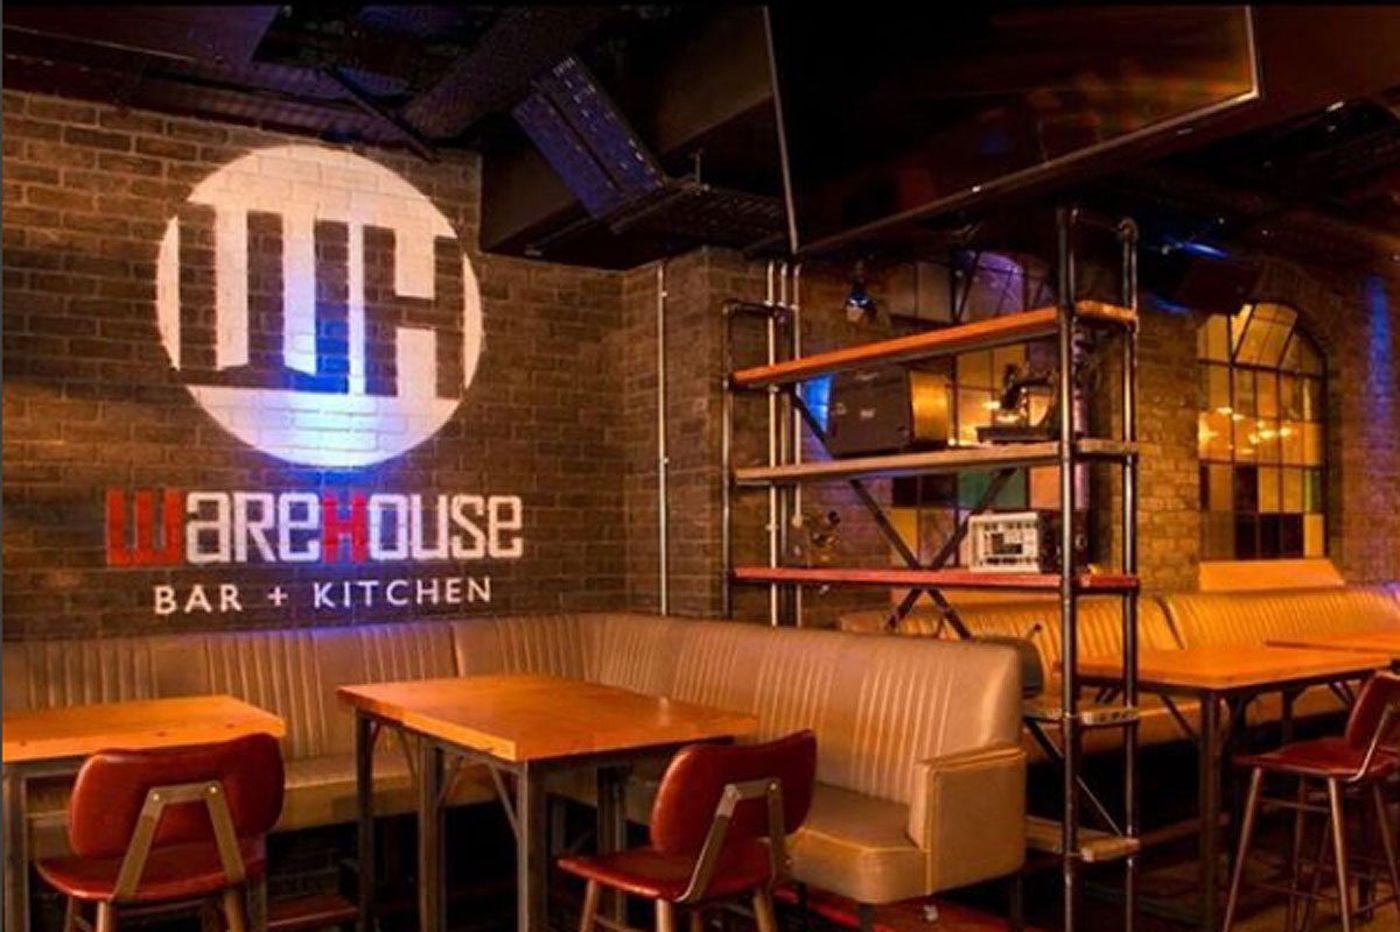 2 restaurants planned for Hale Building on Chestnut St.